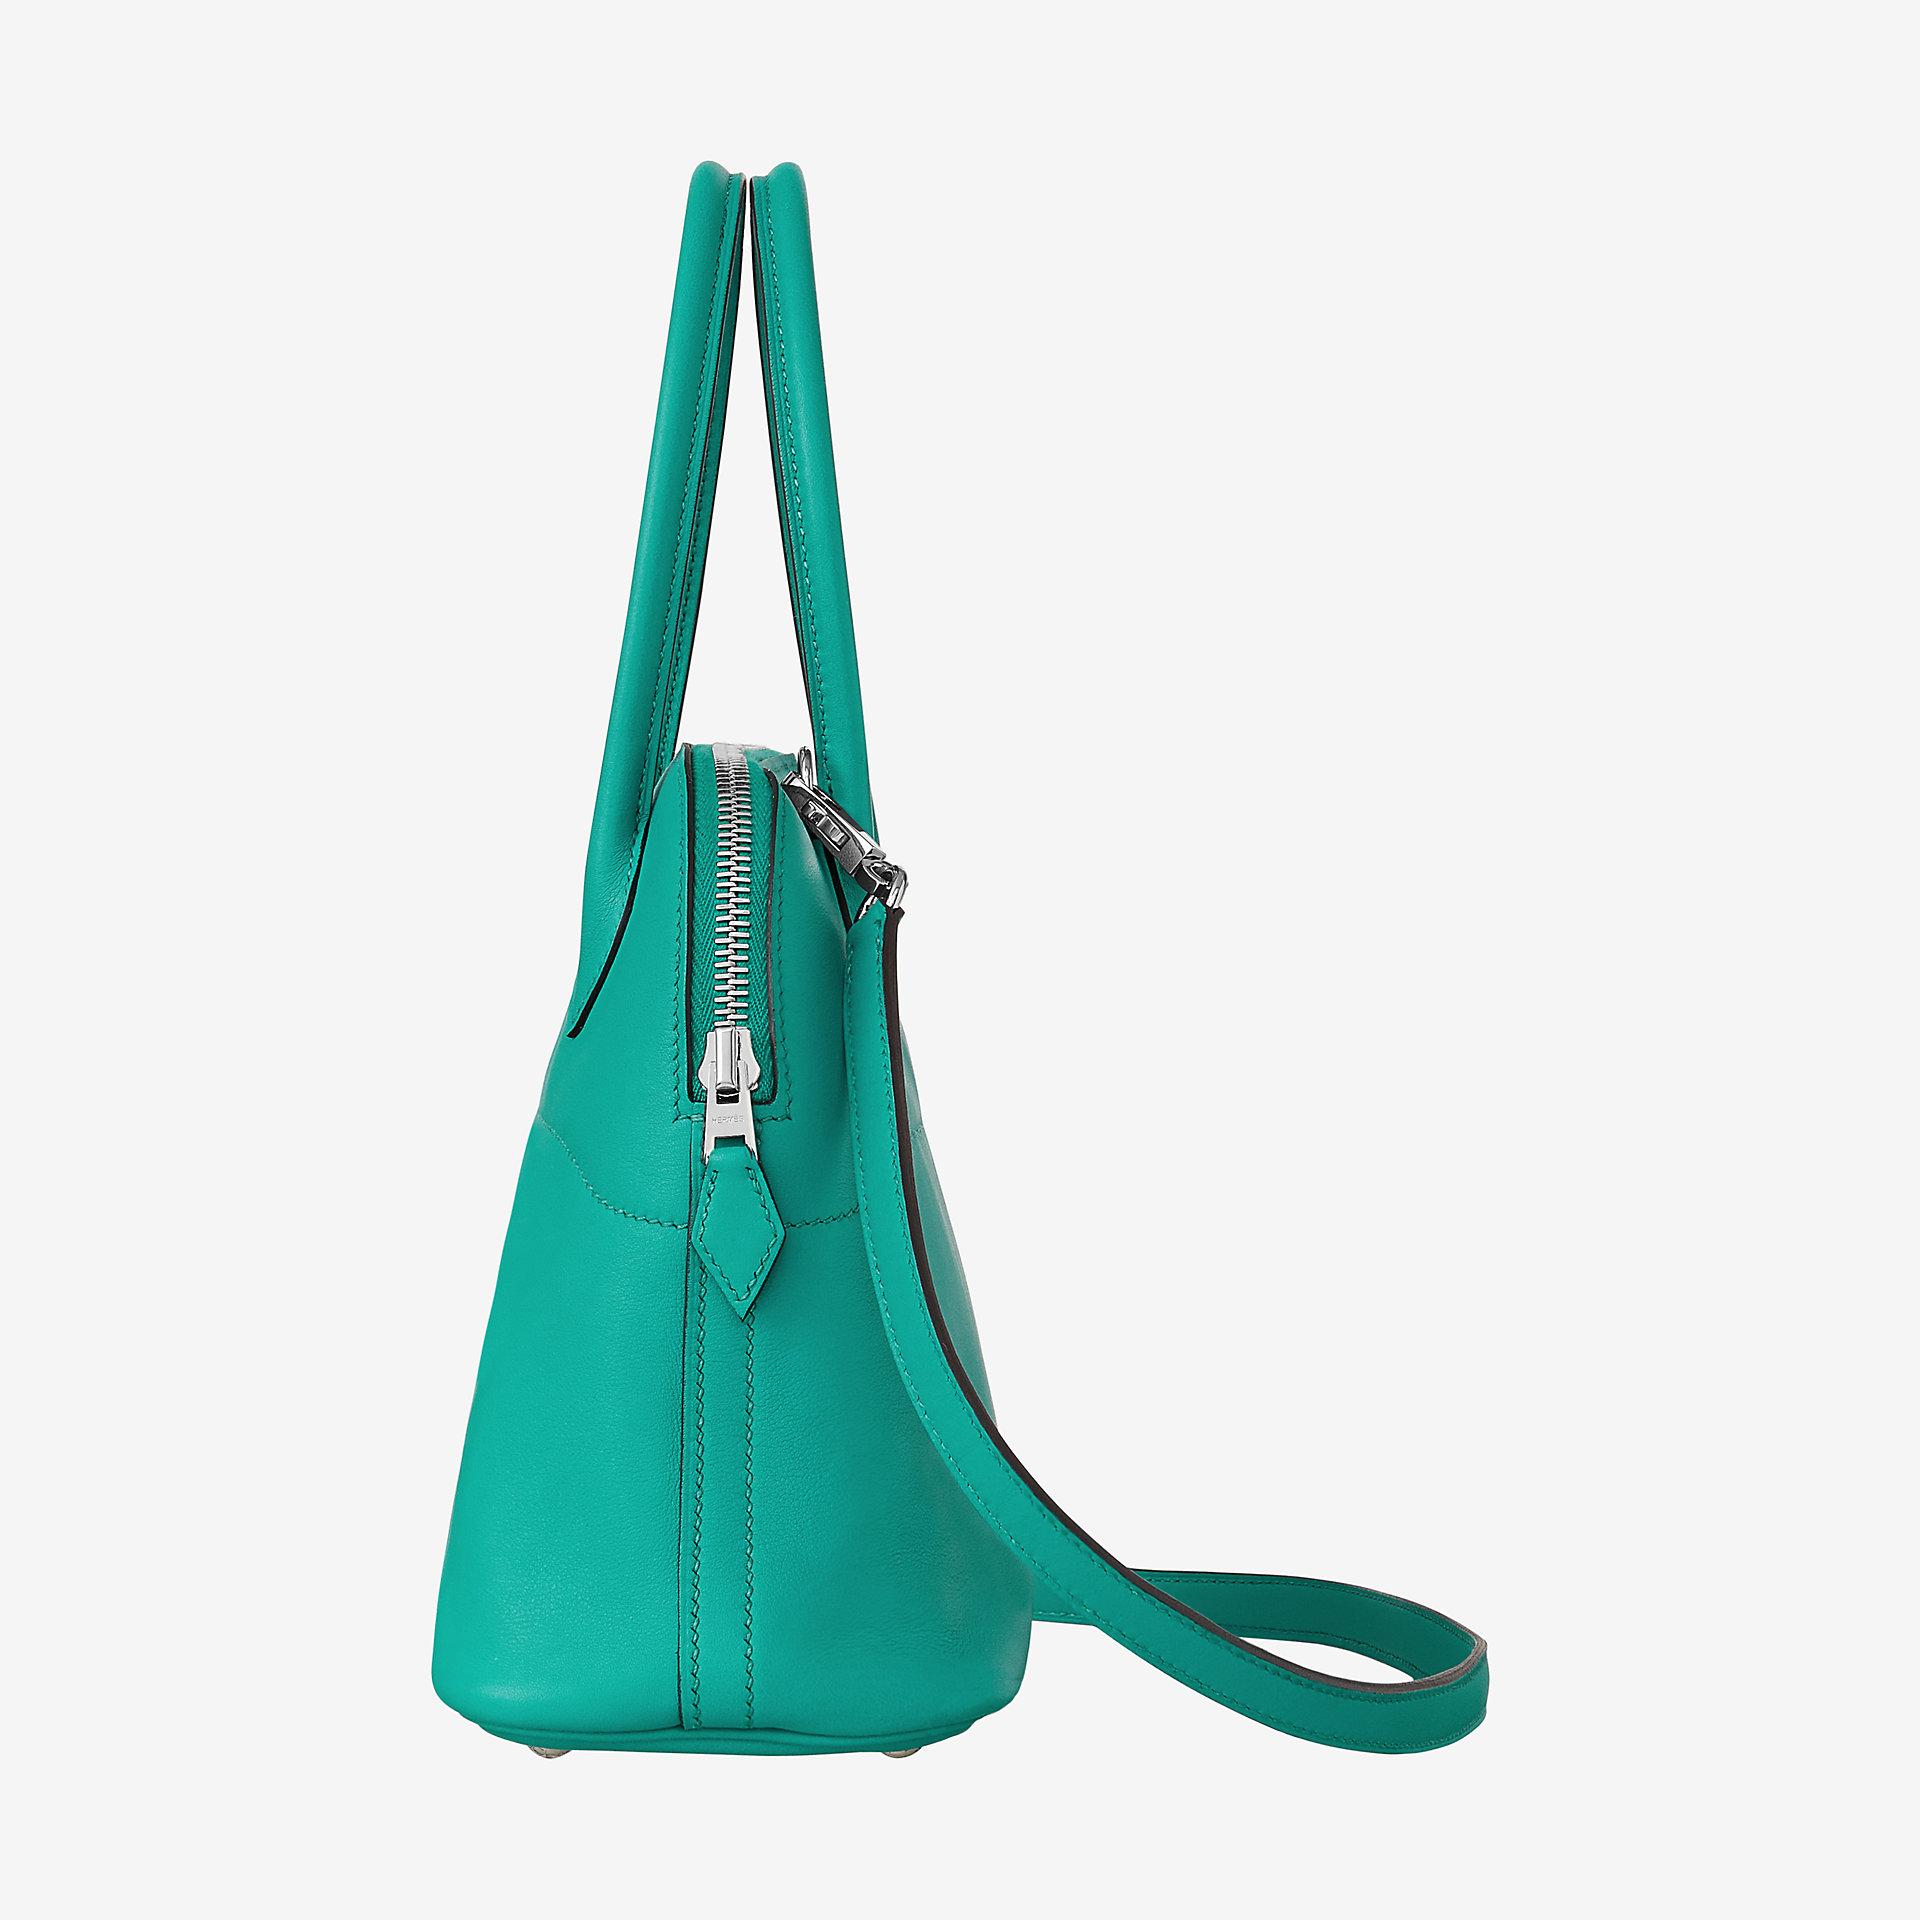 Saudi Arabia Hermes Bolide 27cm bag CK7F bleu paon Swift calfskin